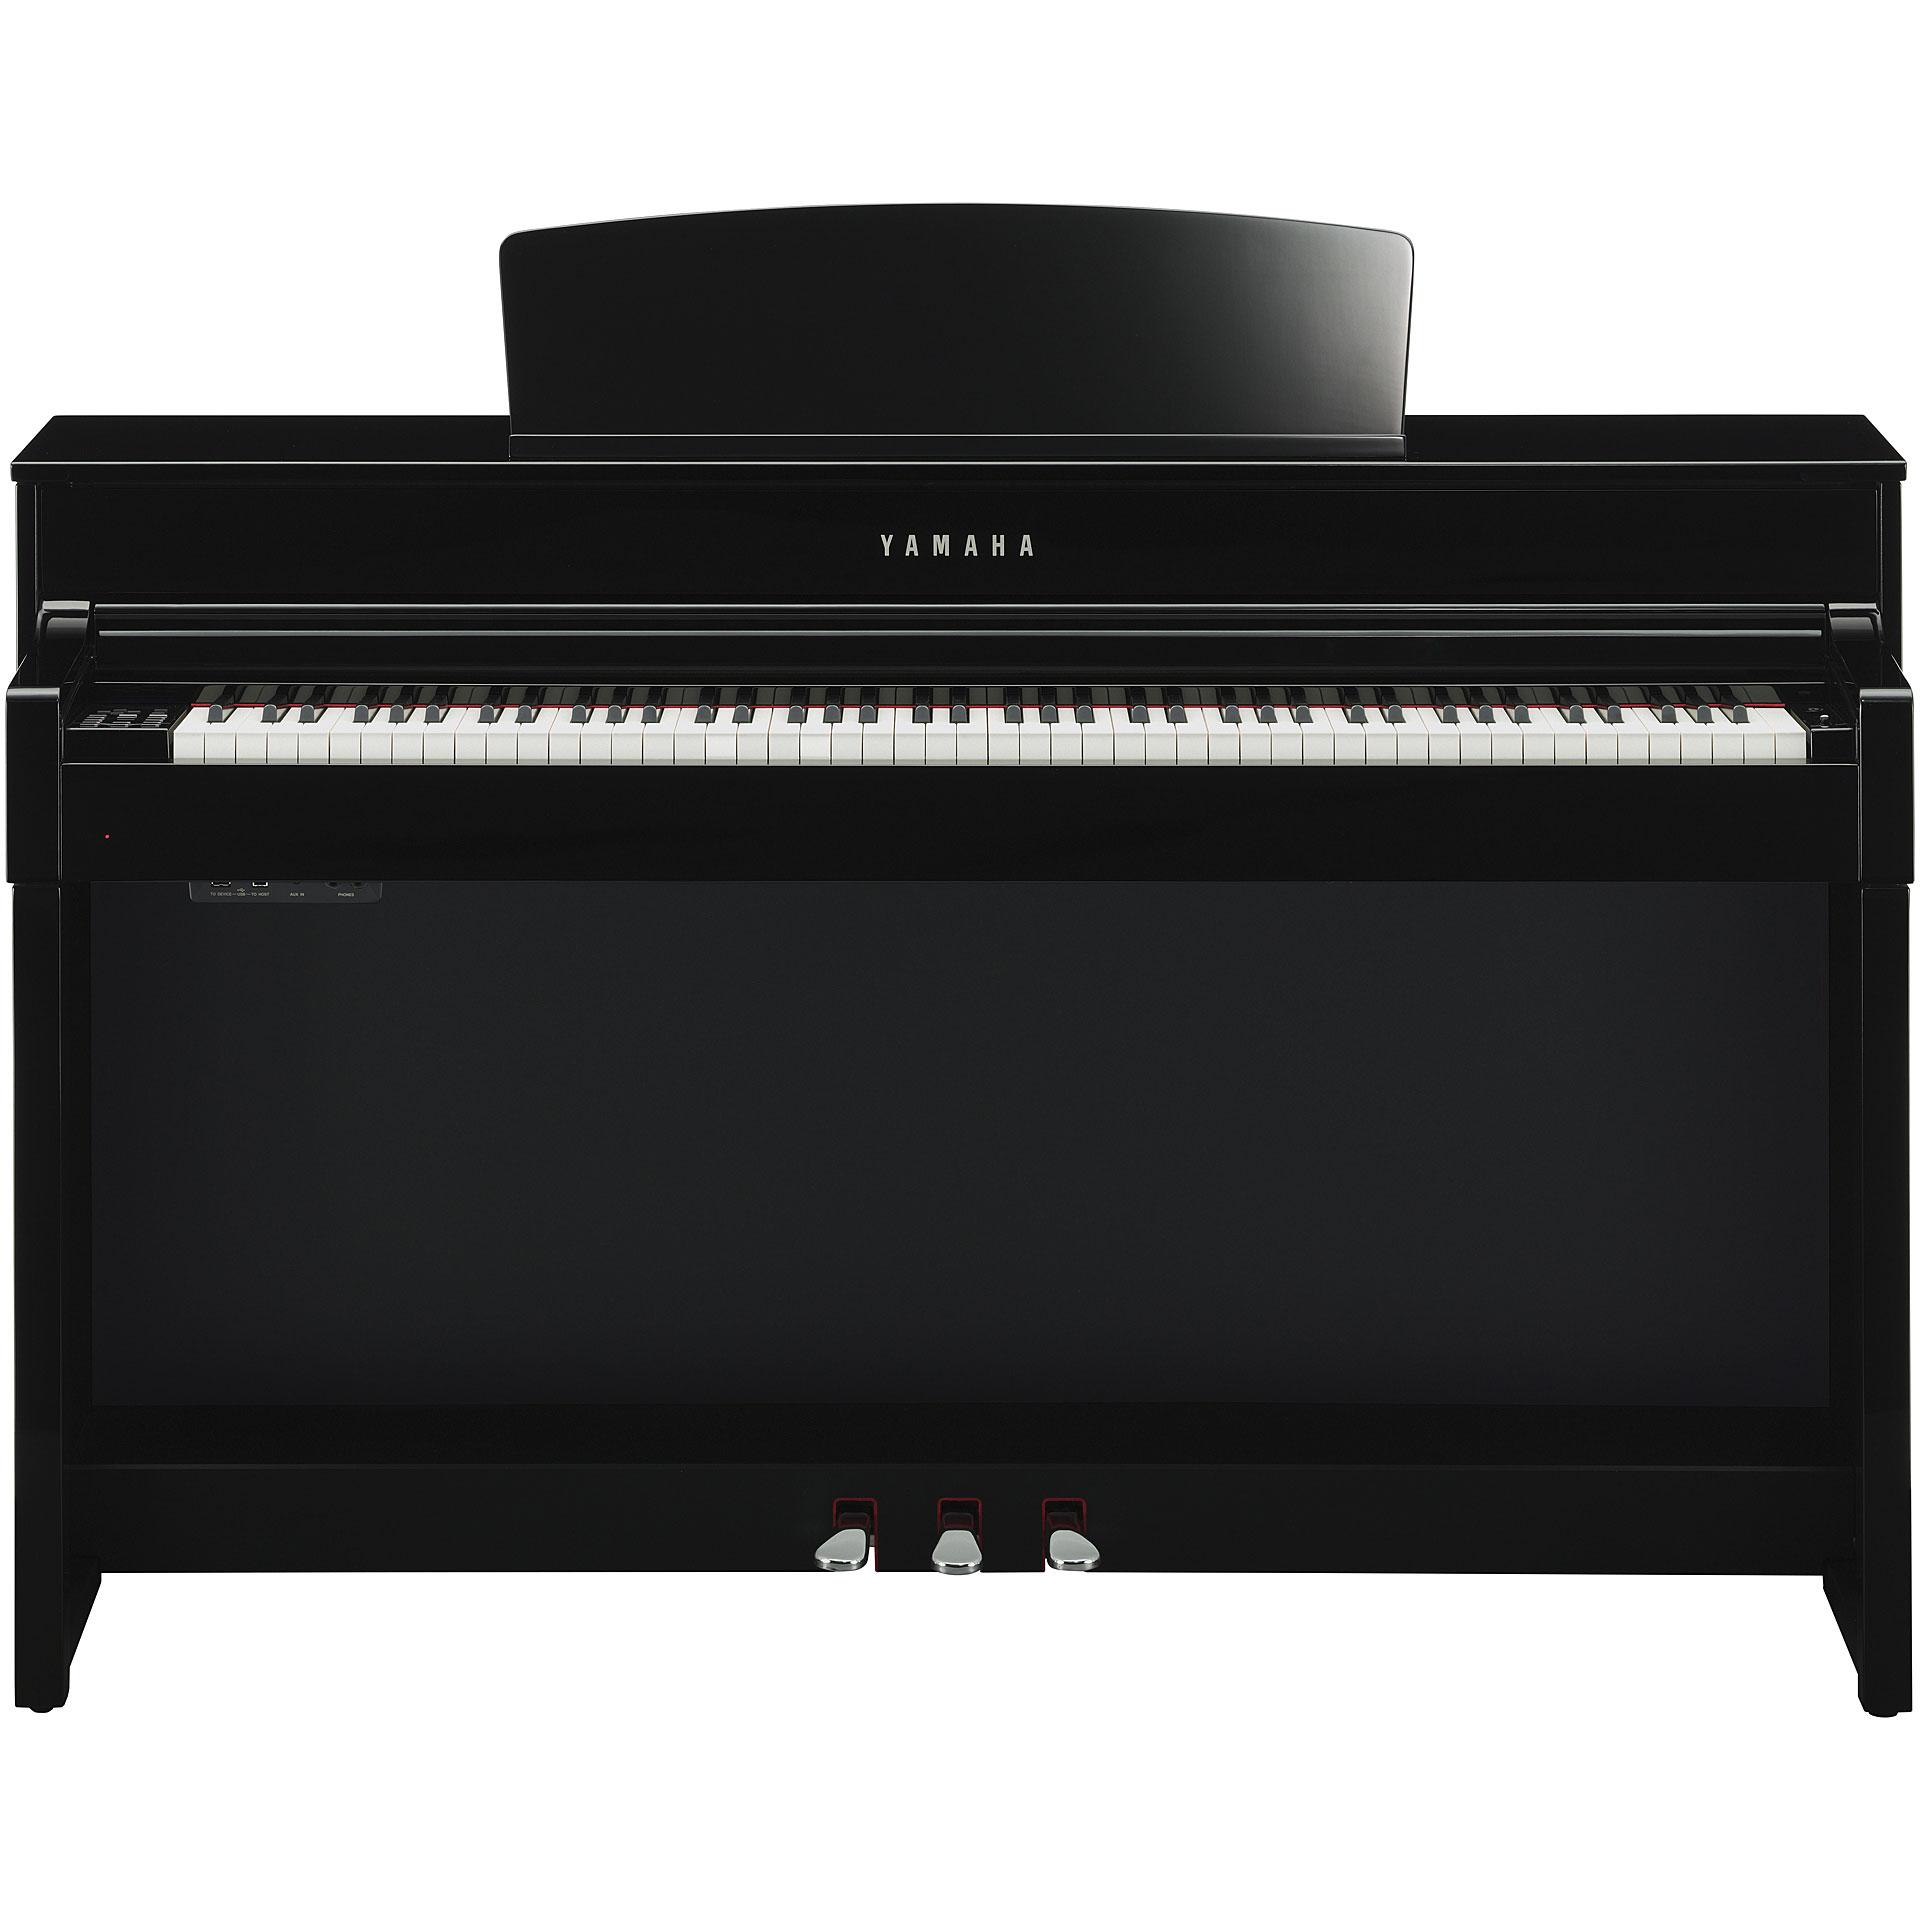 yamaha clavinova clp 545pe digital piano. Black Bedroom Furniture Sets. Home Design Ideas